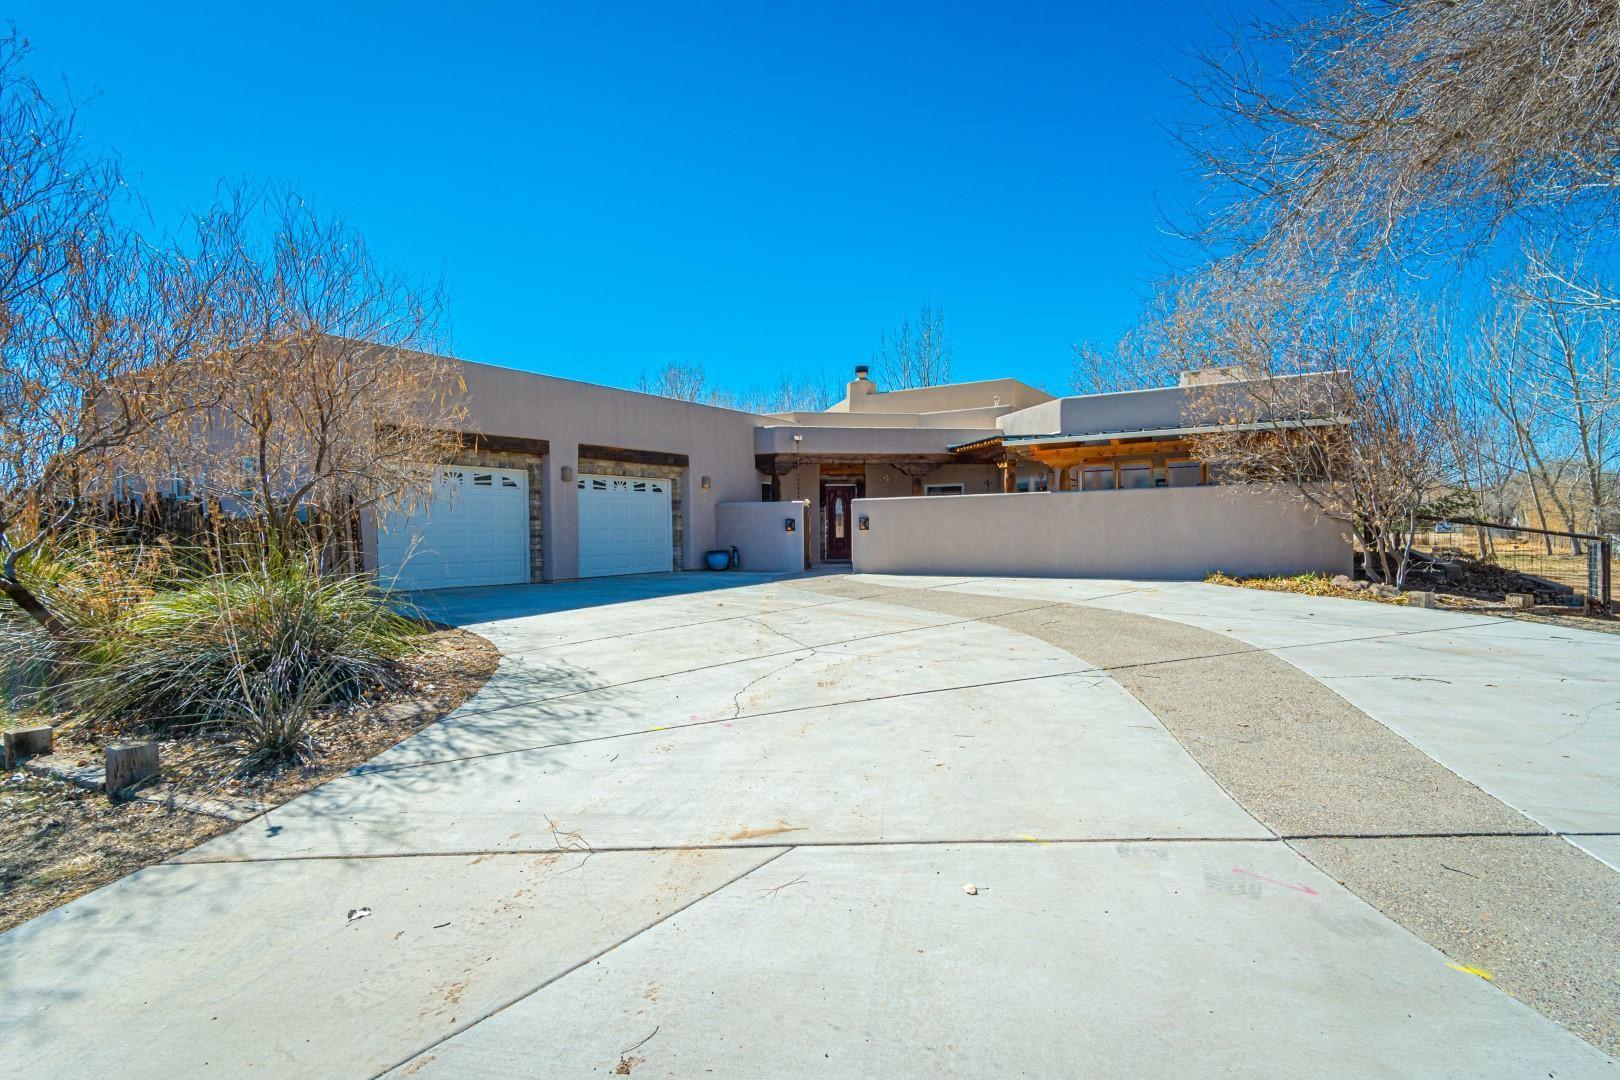 2 RIVERSIDE Court, Peralta, NM 87042 - MLS#: 986380